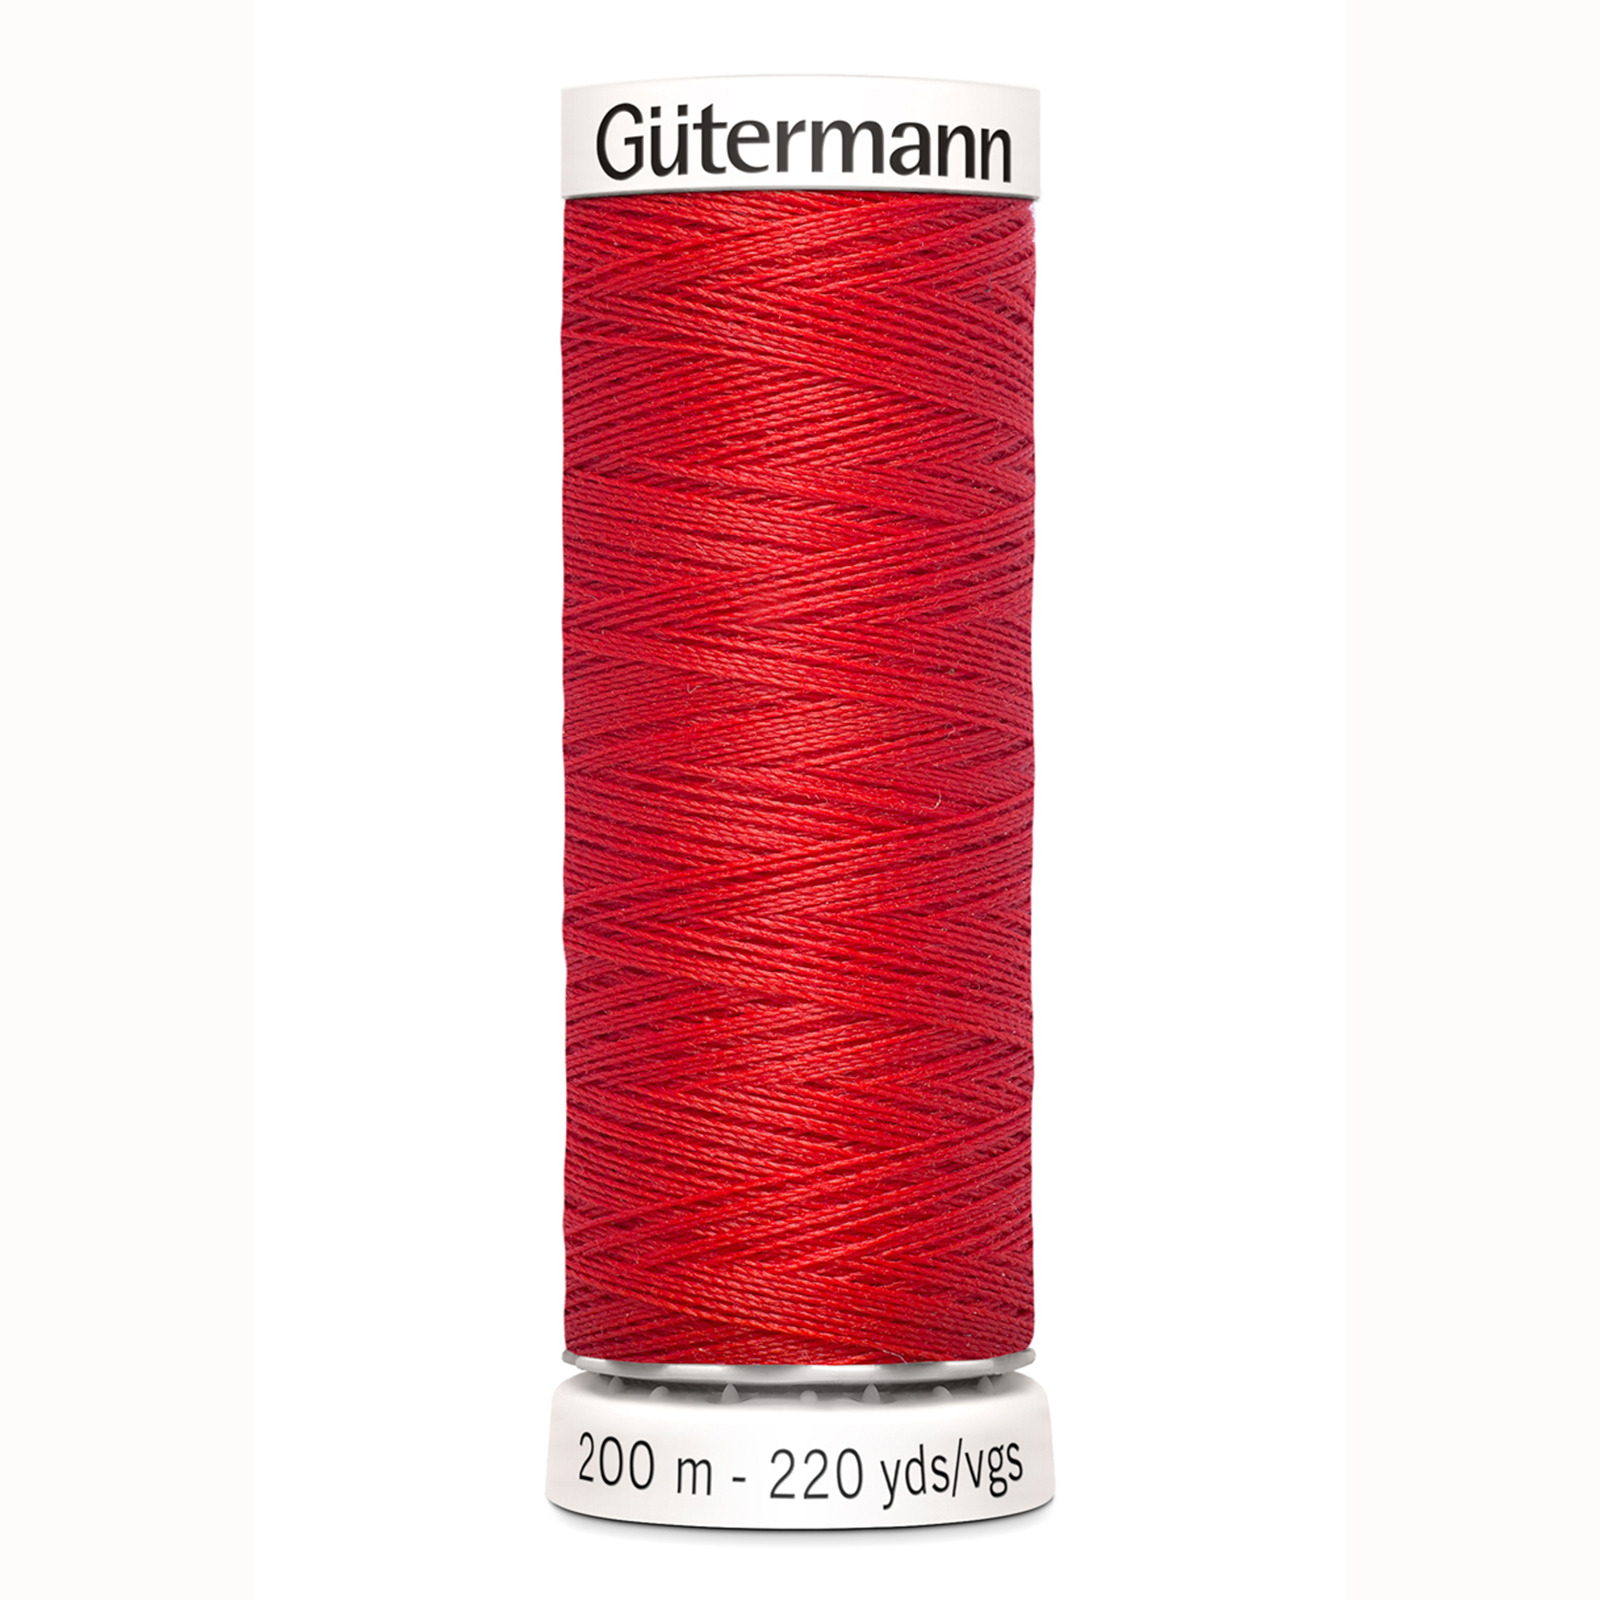 Gutermann Polyestr 200m-364